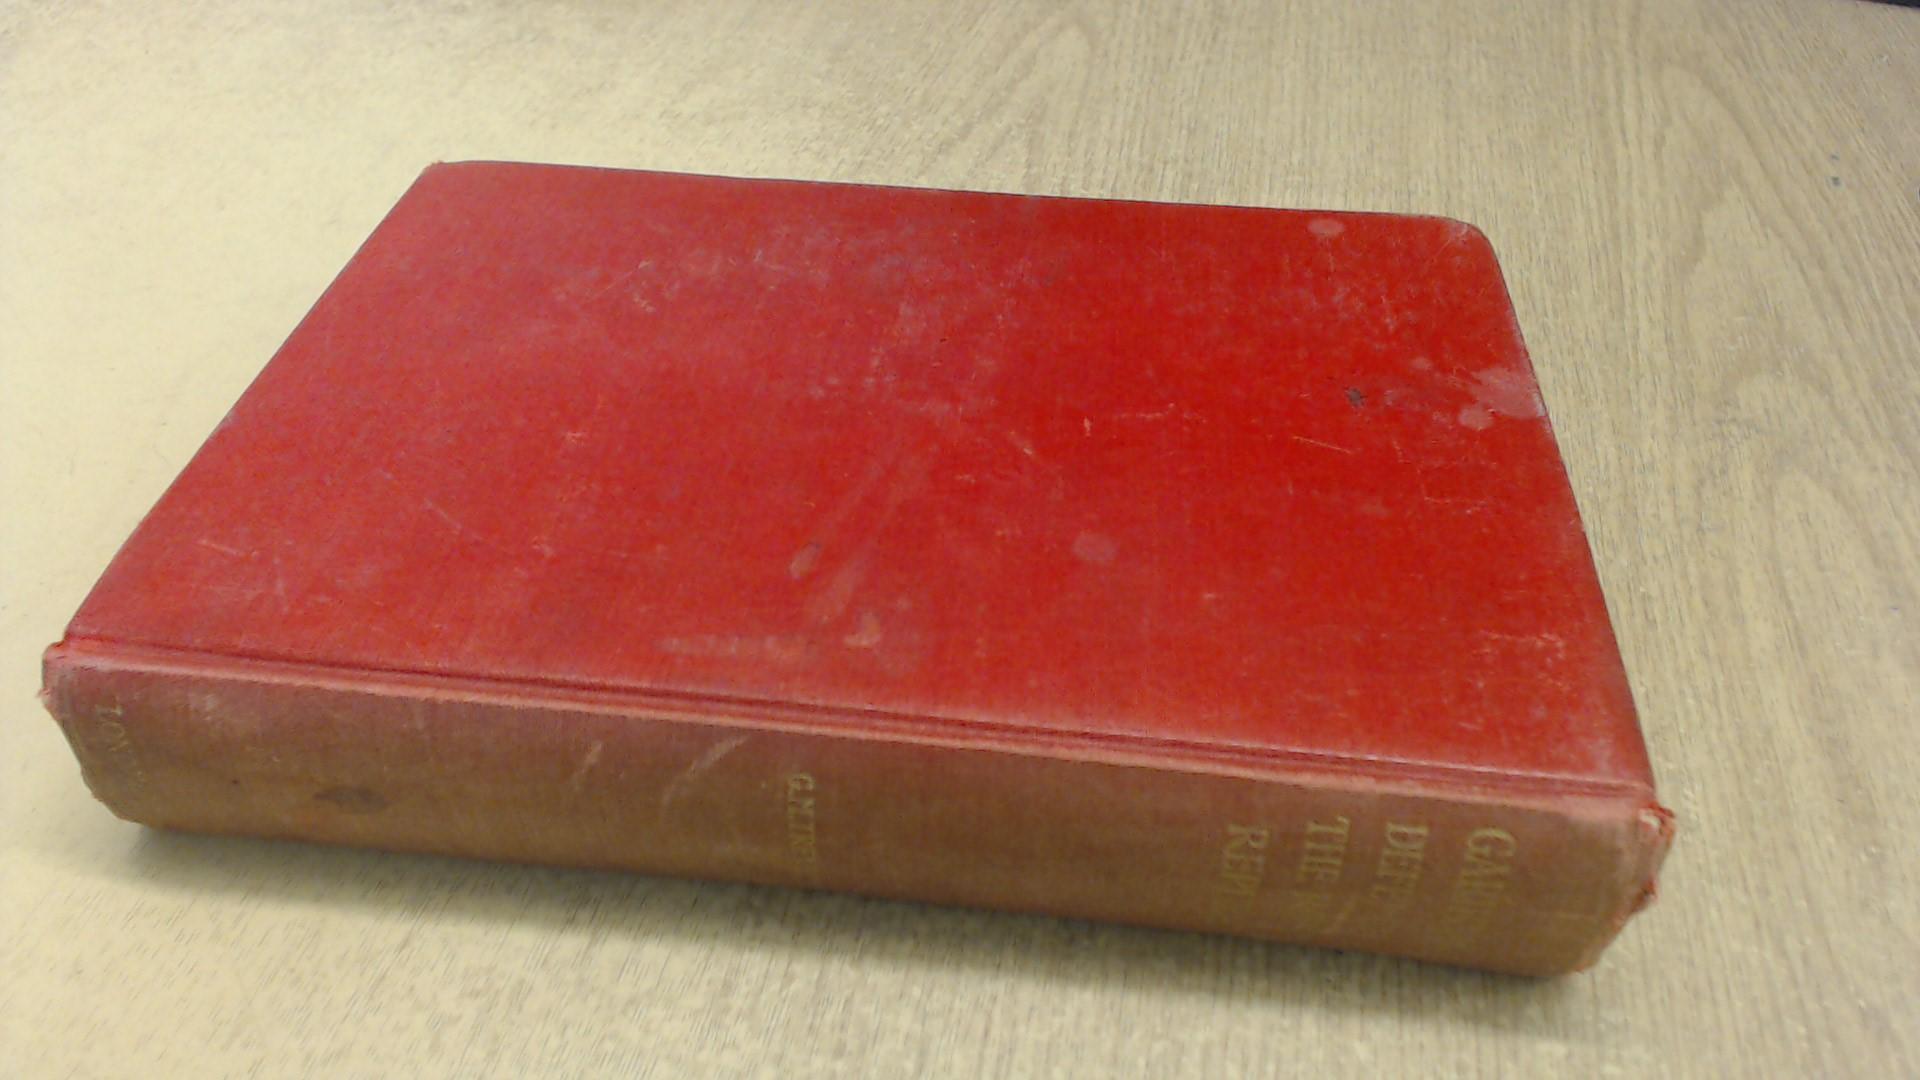 Garibaldi's Defence of the Roman Republic book image